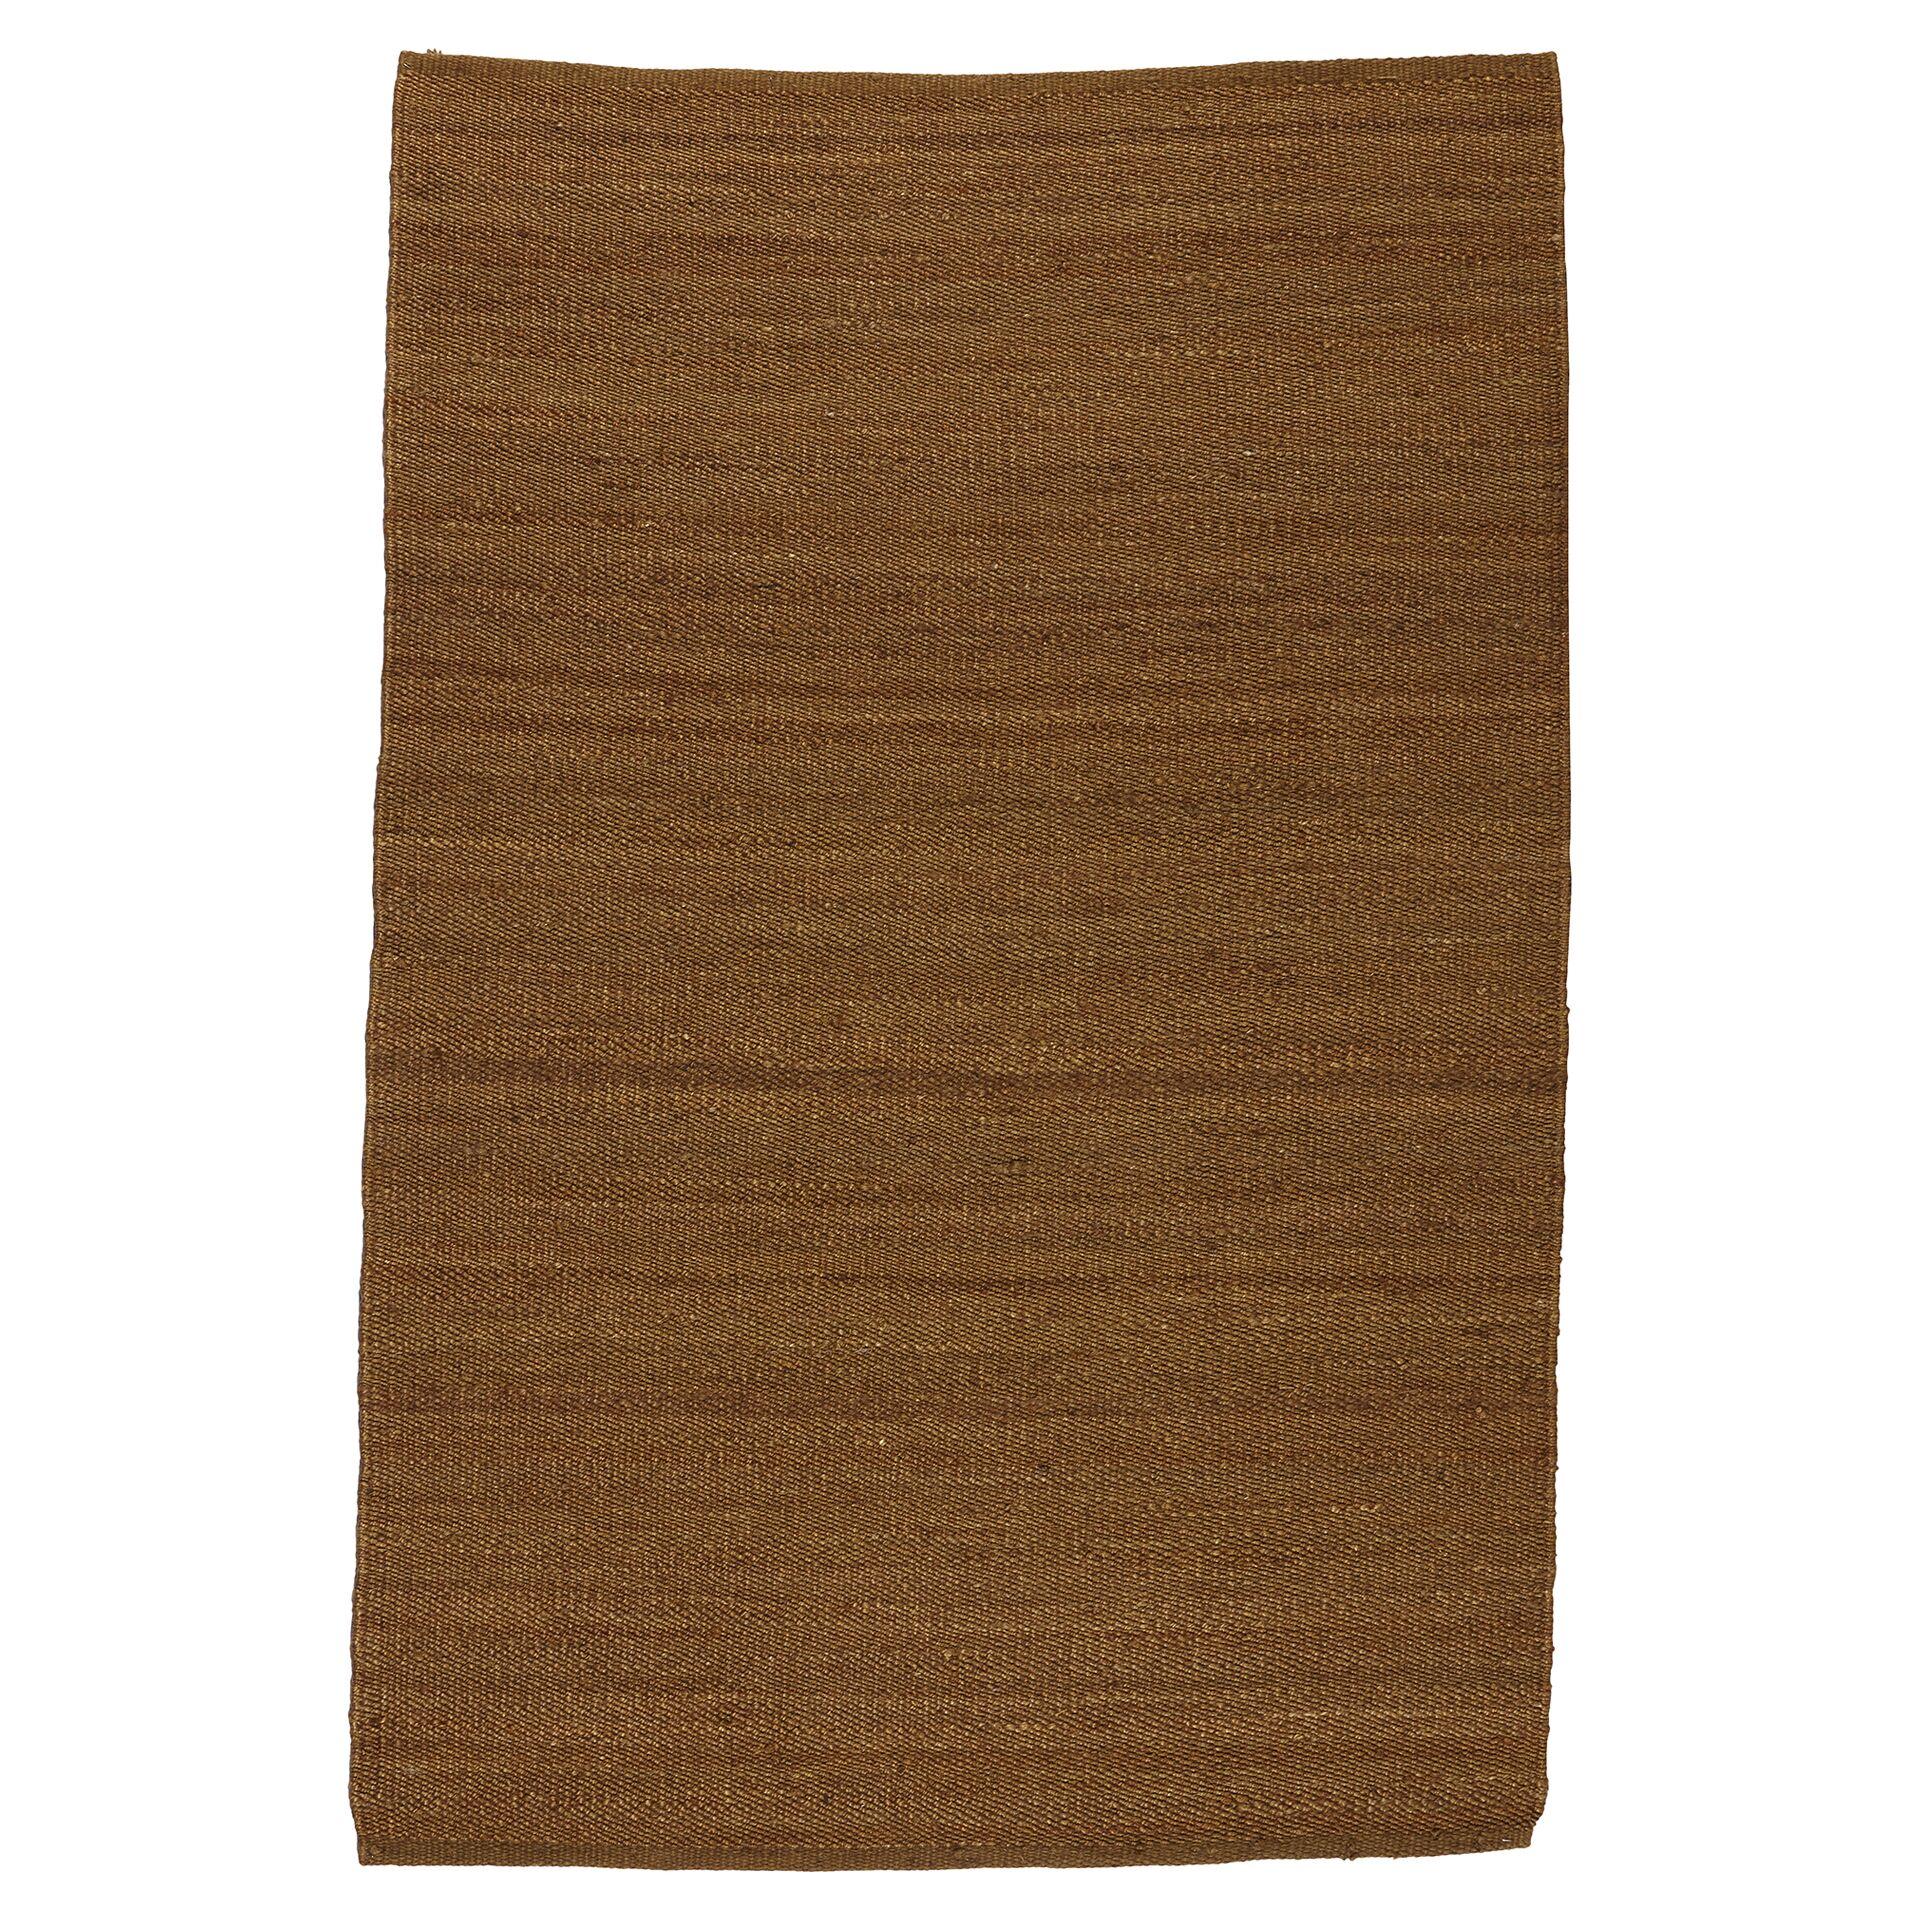 Laflin Hand-Woven Bark Area Rug Size: Rectangle 8' x 10'